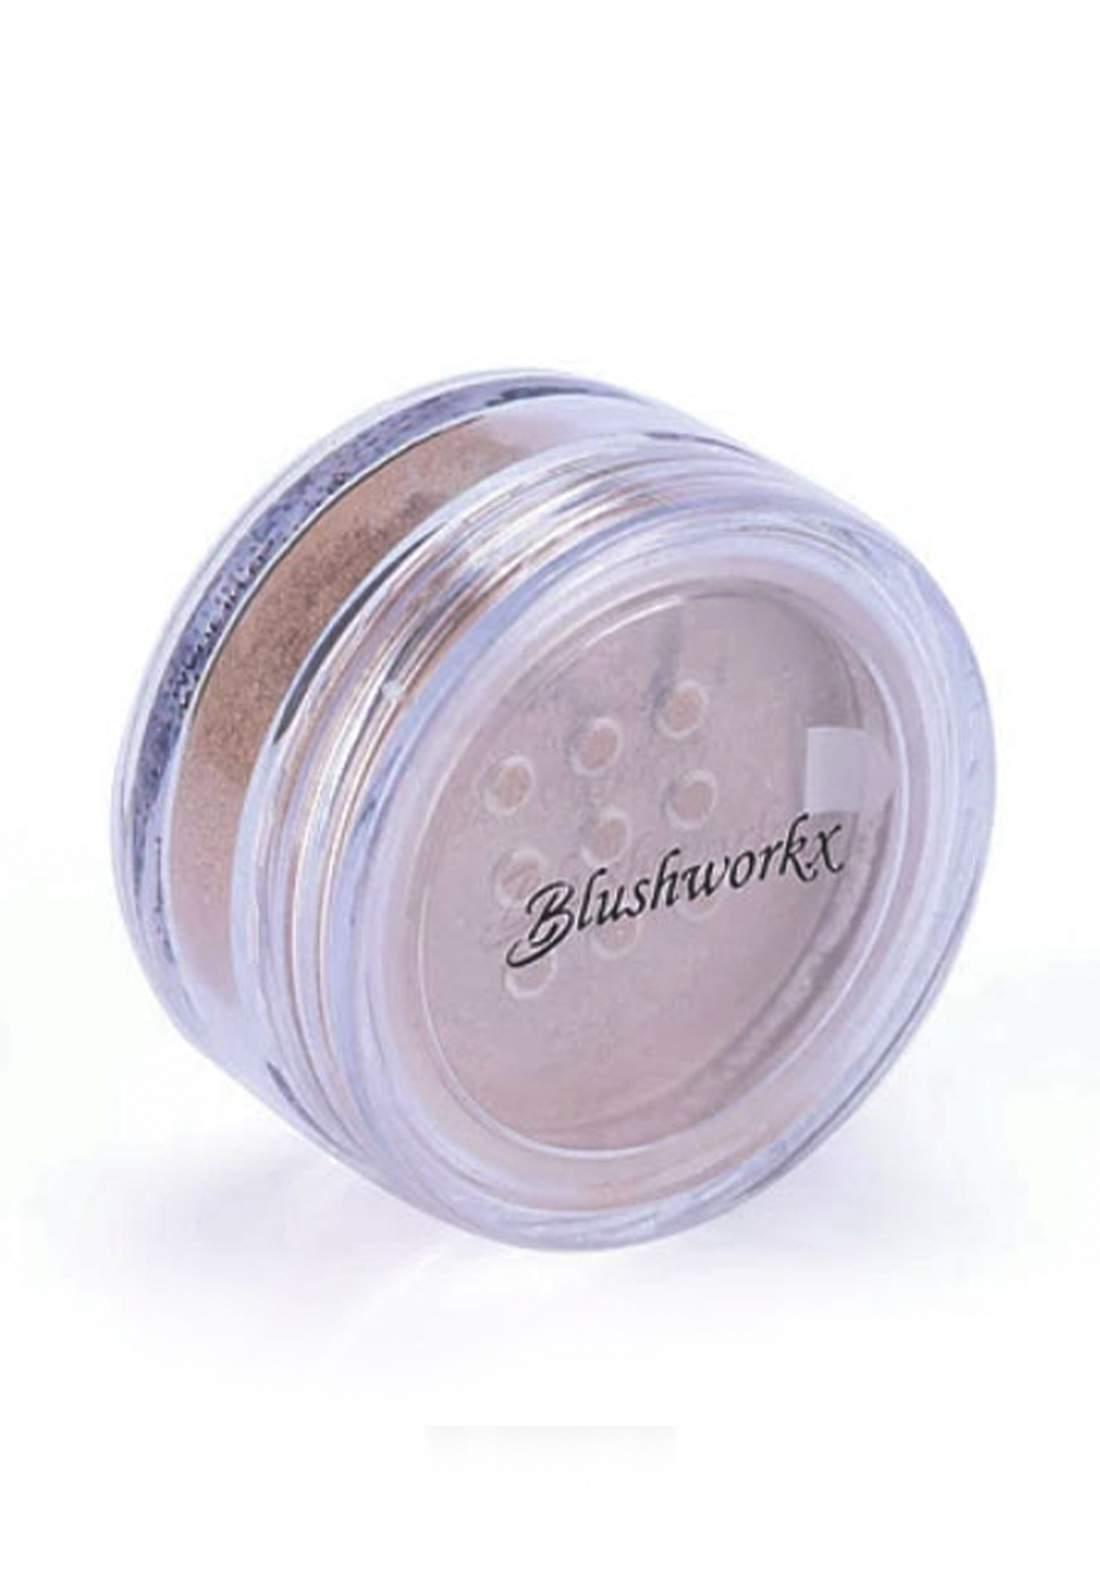 Blushworkx Hollywood Mineral Eye Dust No.47 Sensual  1.5g ظلال للعيون